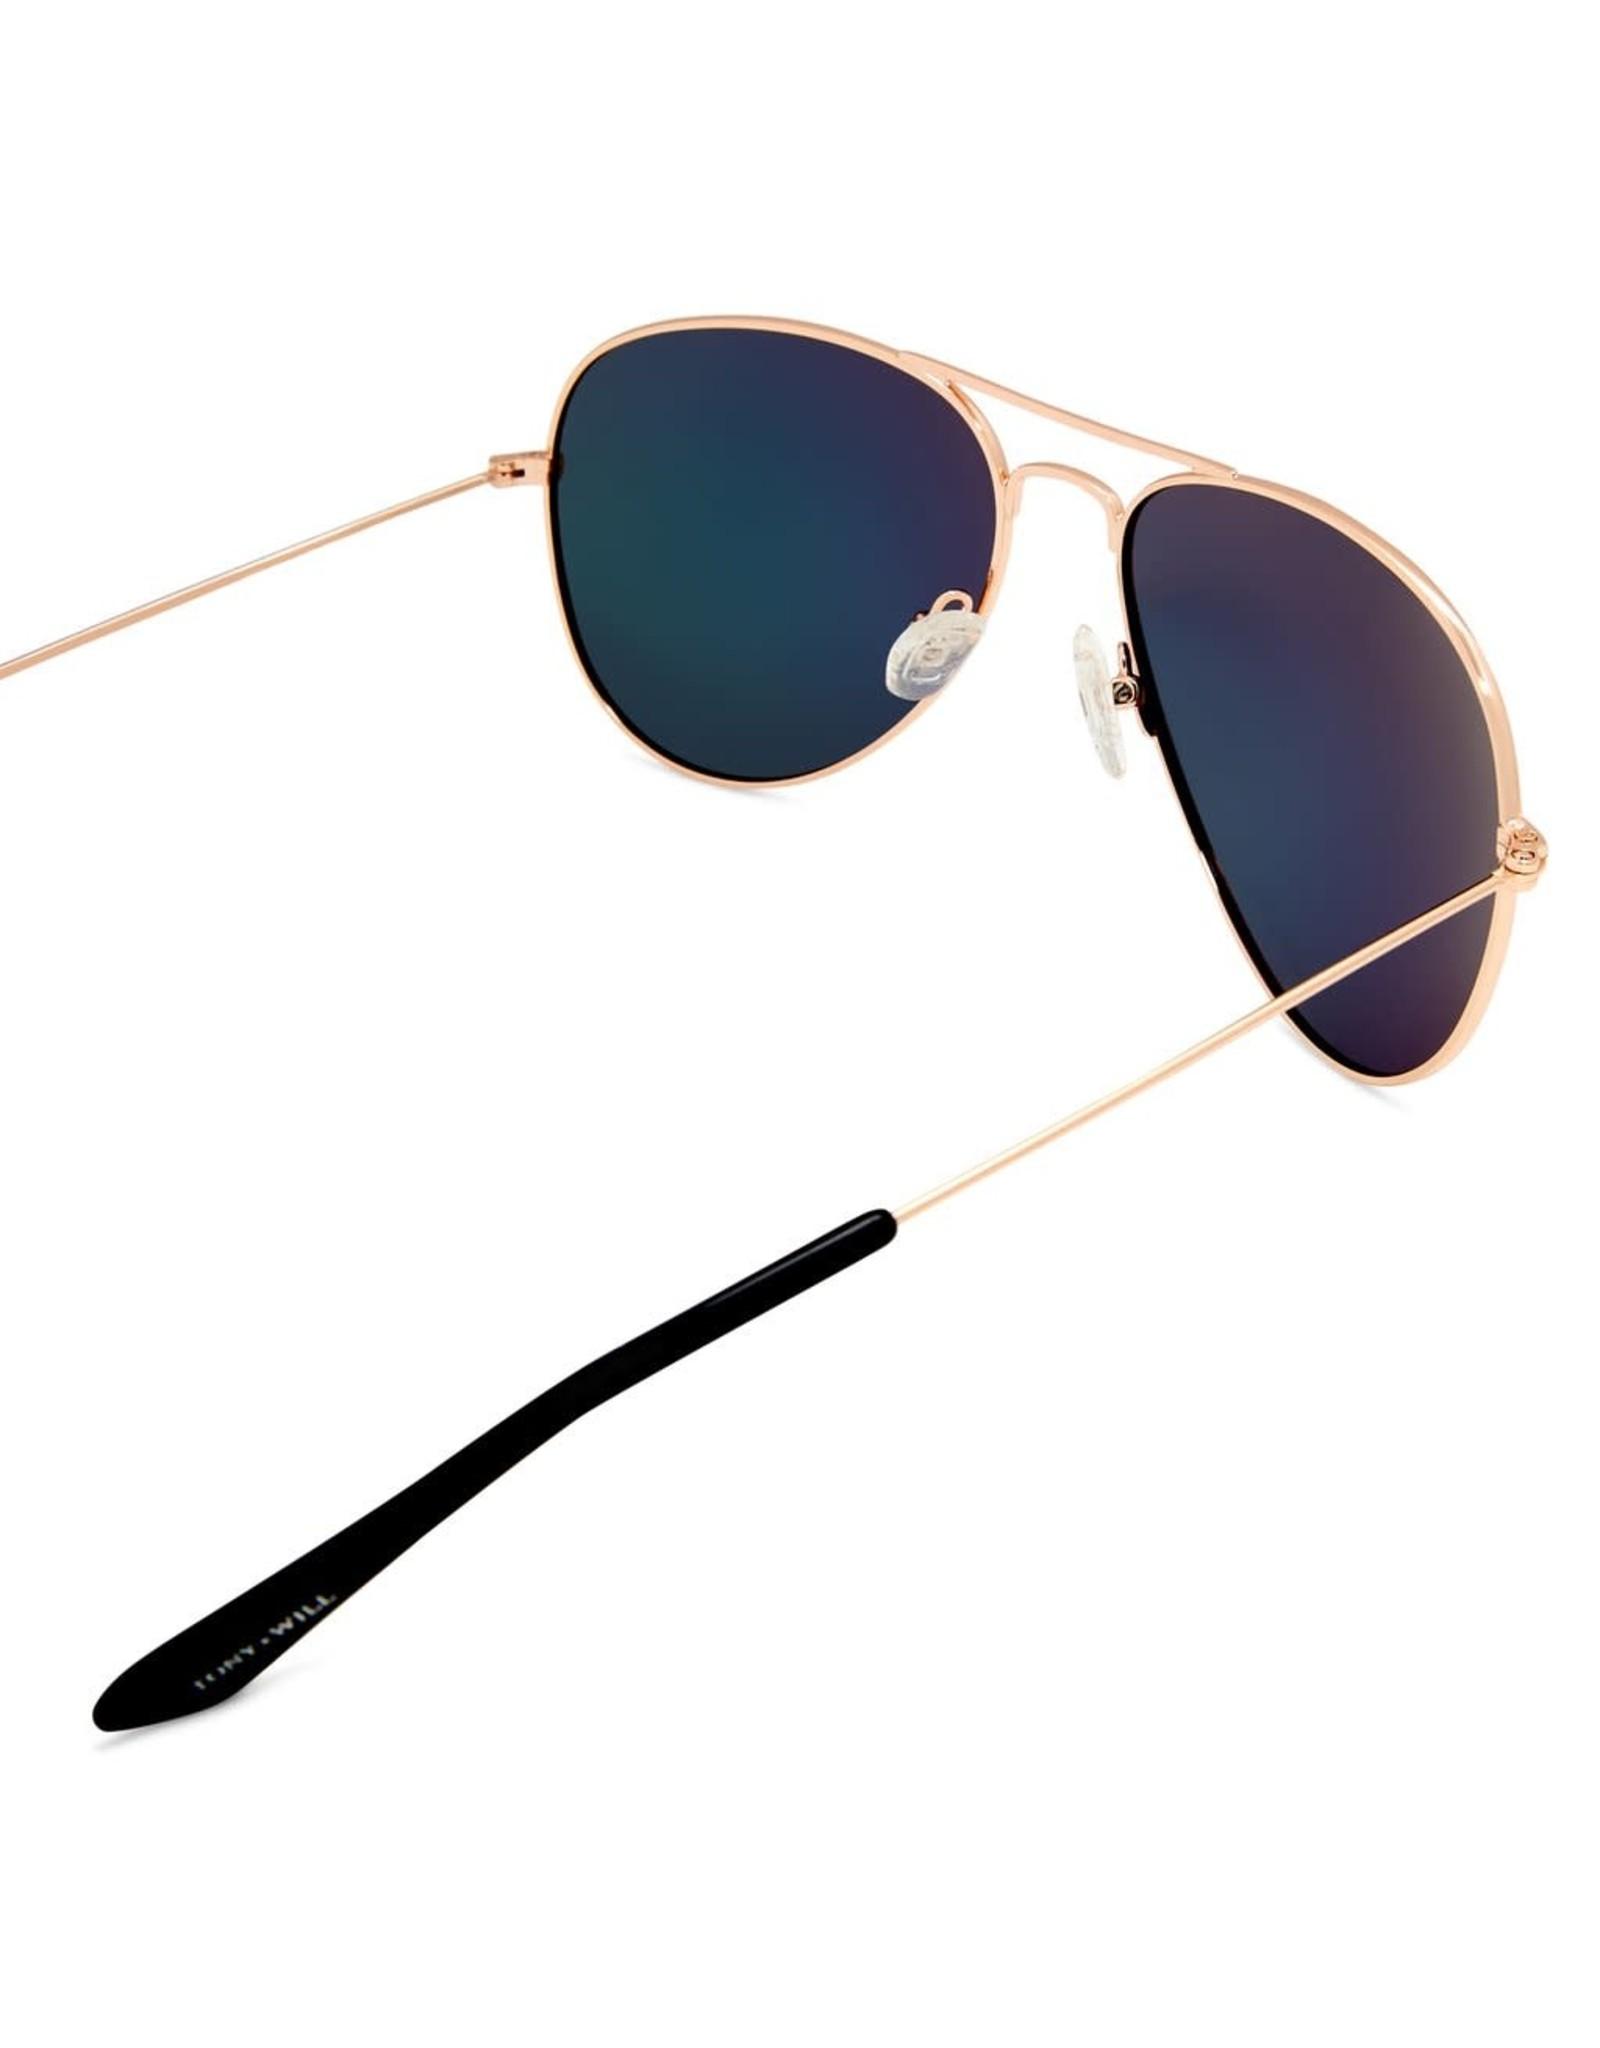 Thames Polorised Vintage Aviator Gold Womens Sunglasses